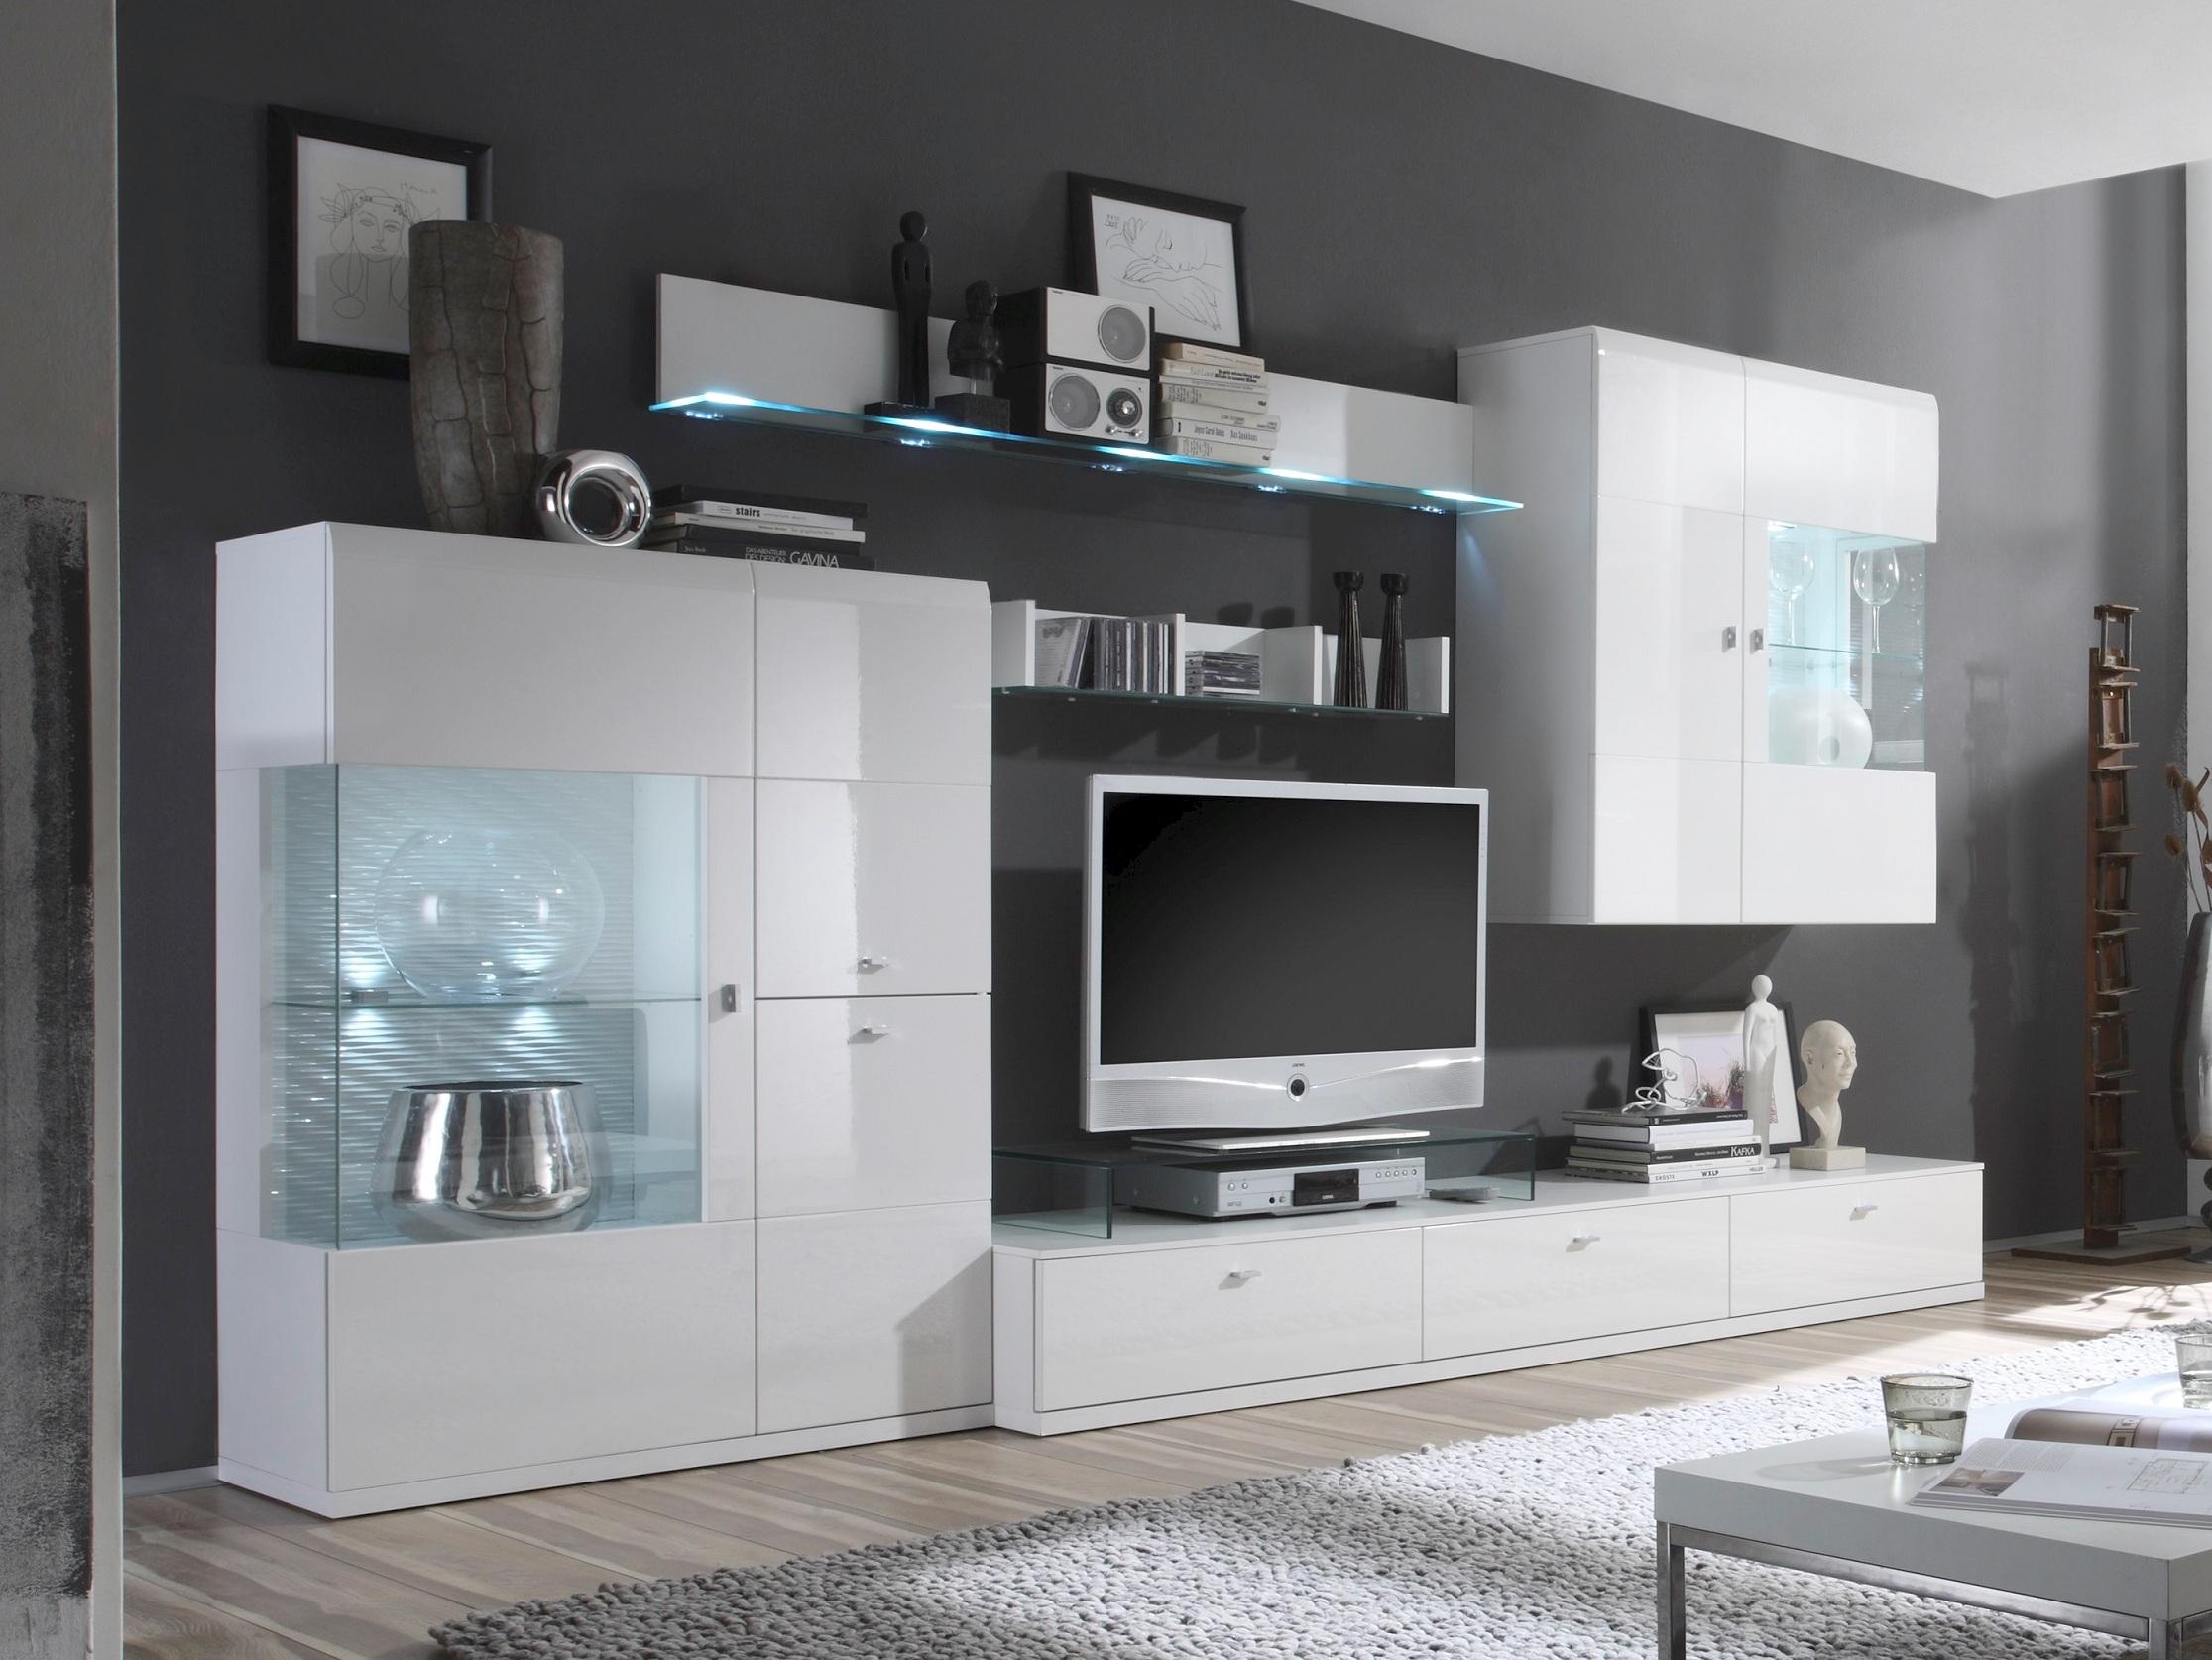 wohnw nde seite 13. Black Bedroom Furniture Sets. Home Design Ideas